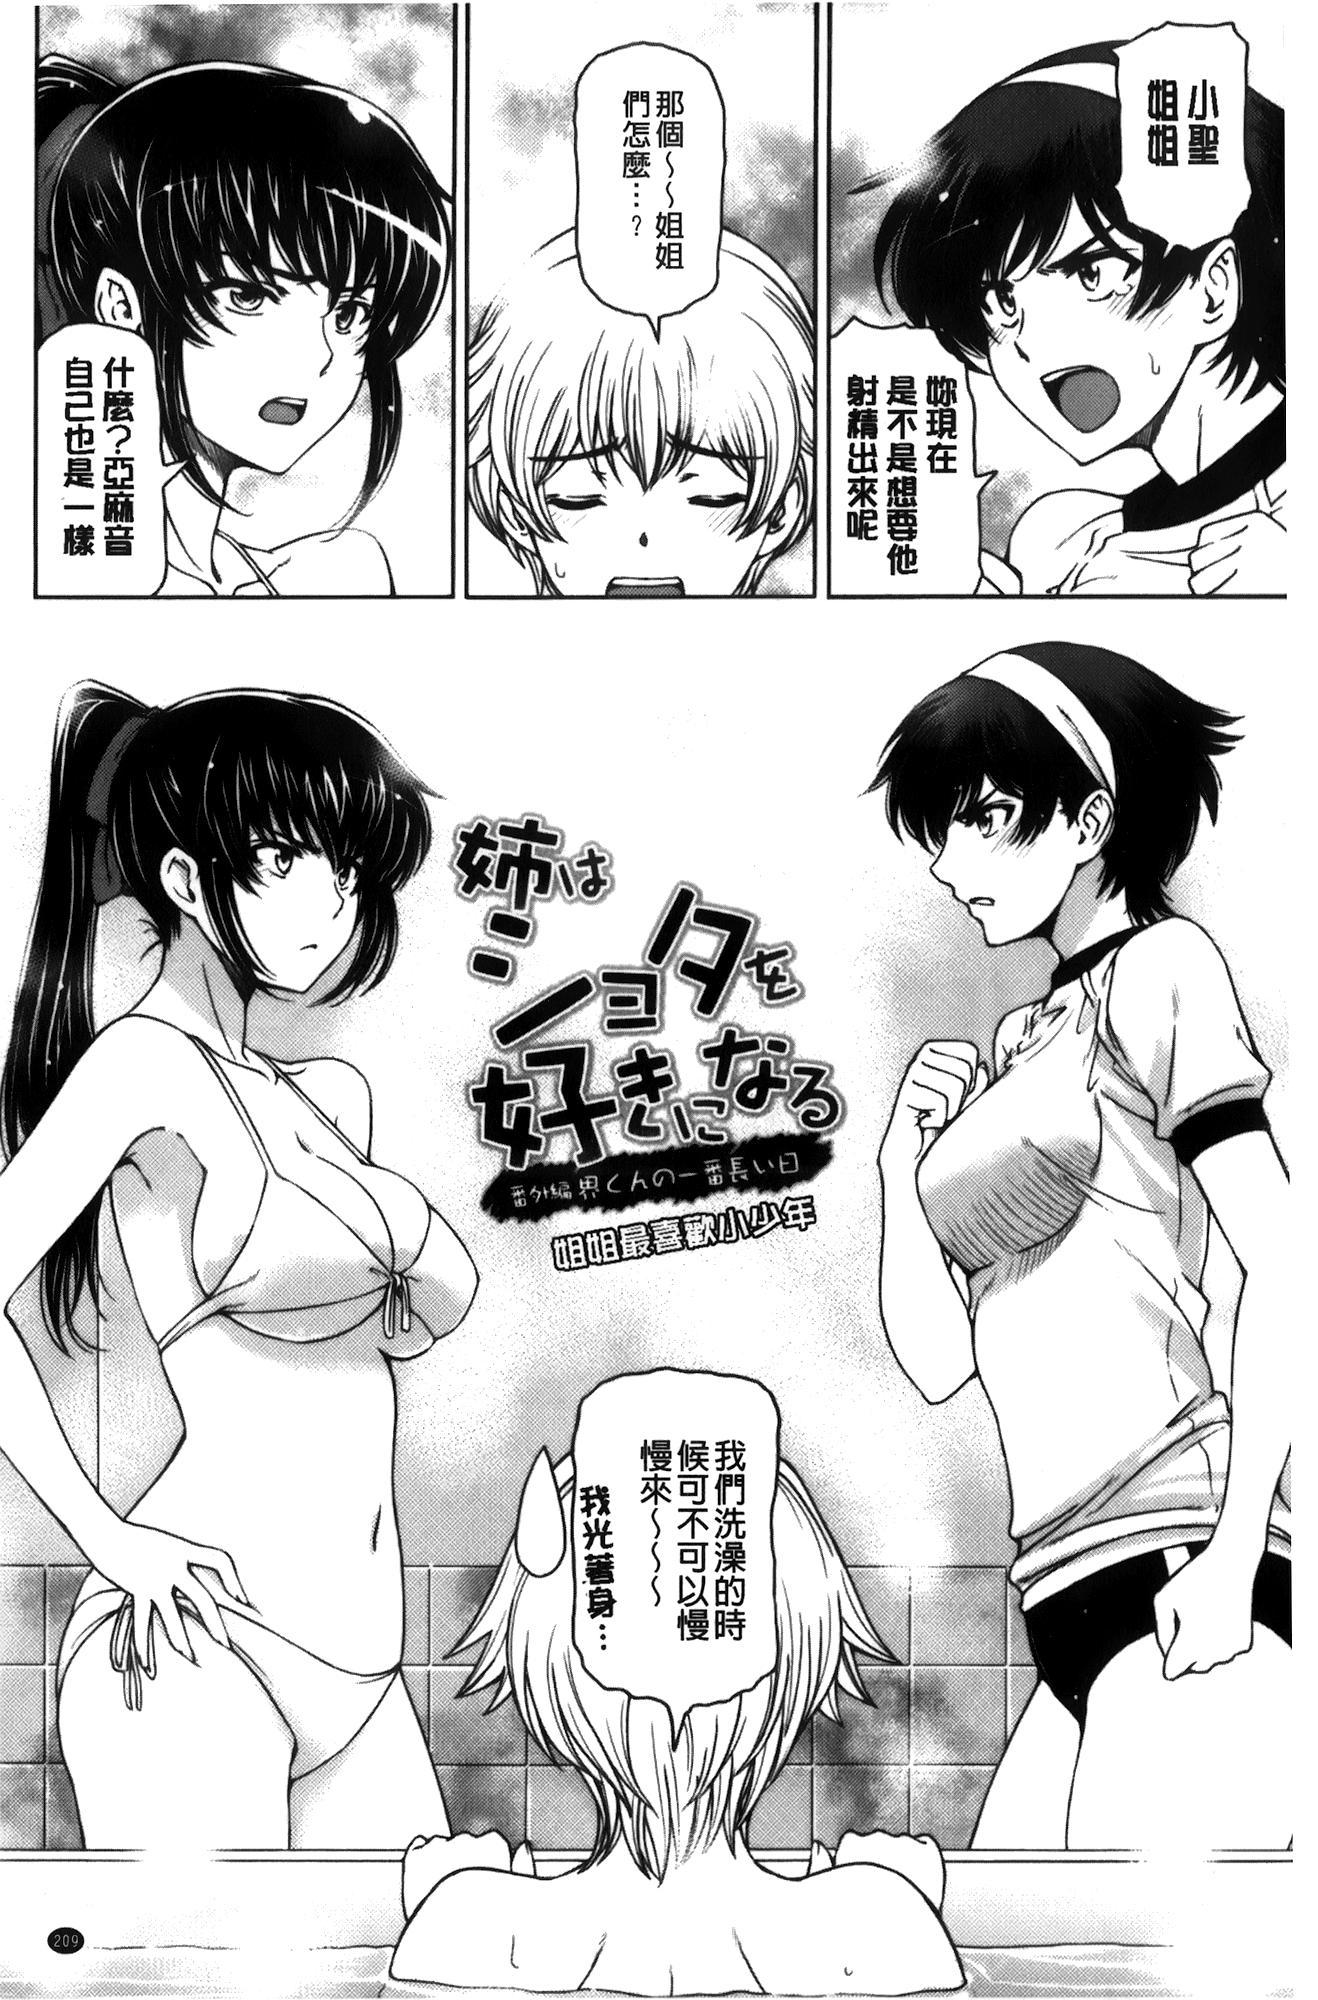 Majo × Shota ~ Genteiban | 魔女X小正太 限定版 217